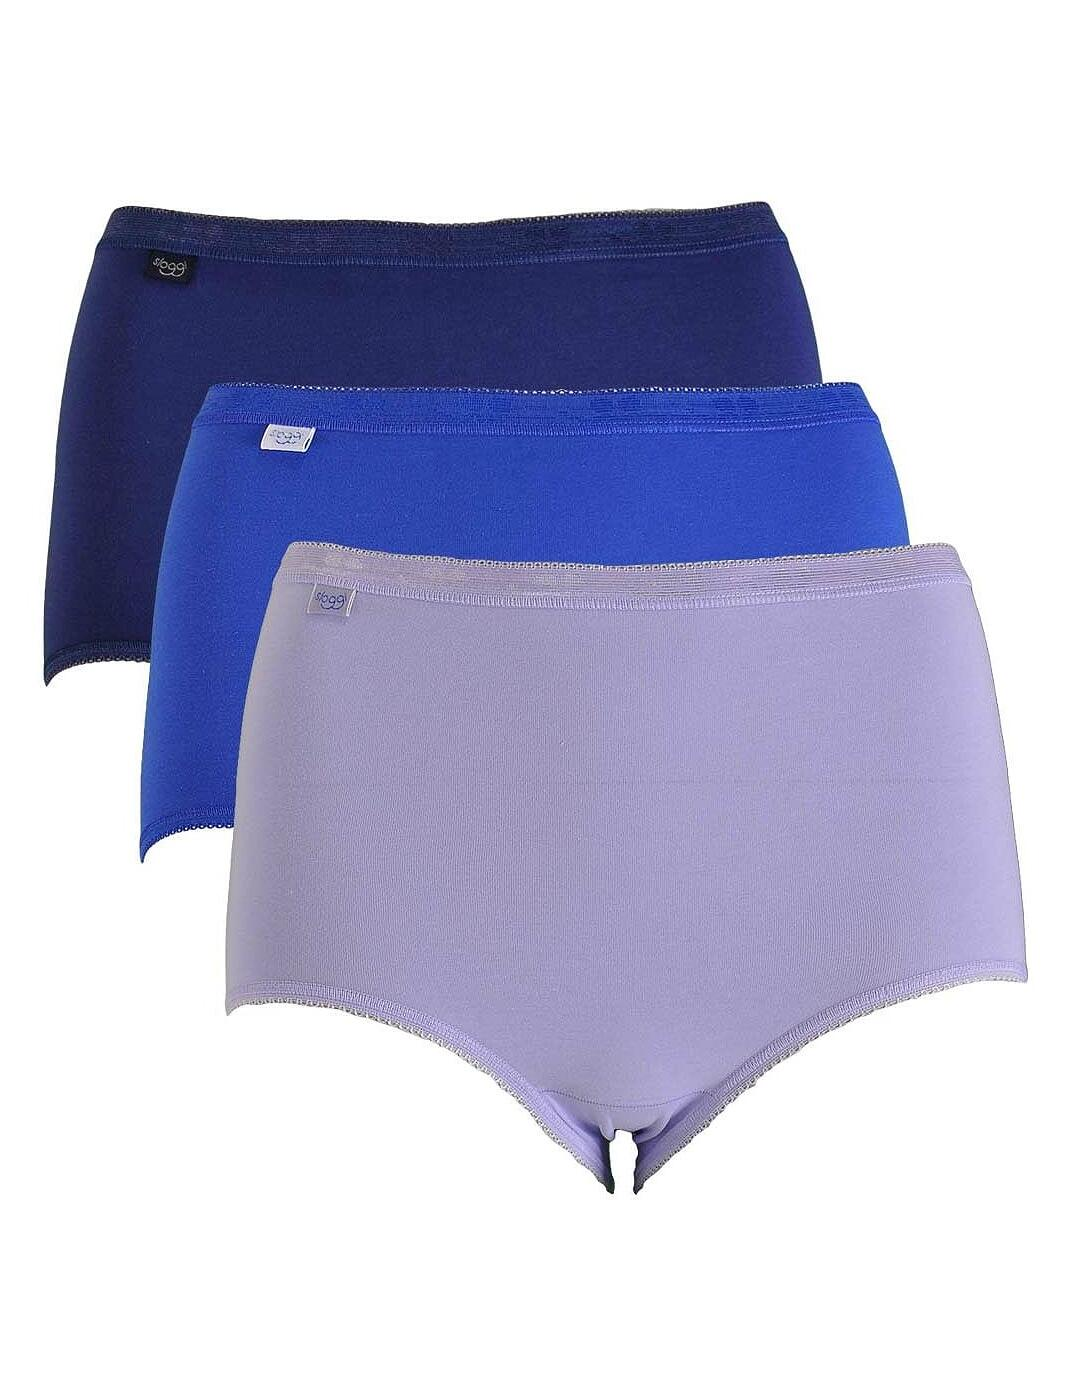 10105593 Sloggi Basic Maxi Brief 3 Pack - 10105593 Blue/Lilac/Navy